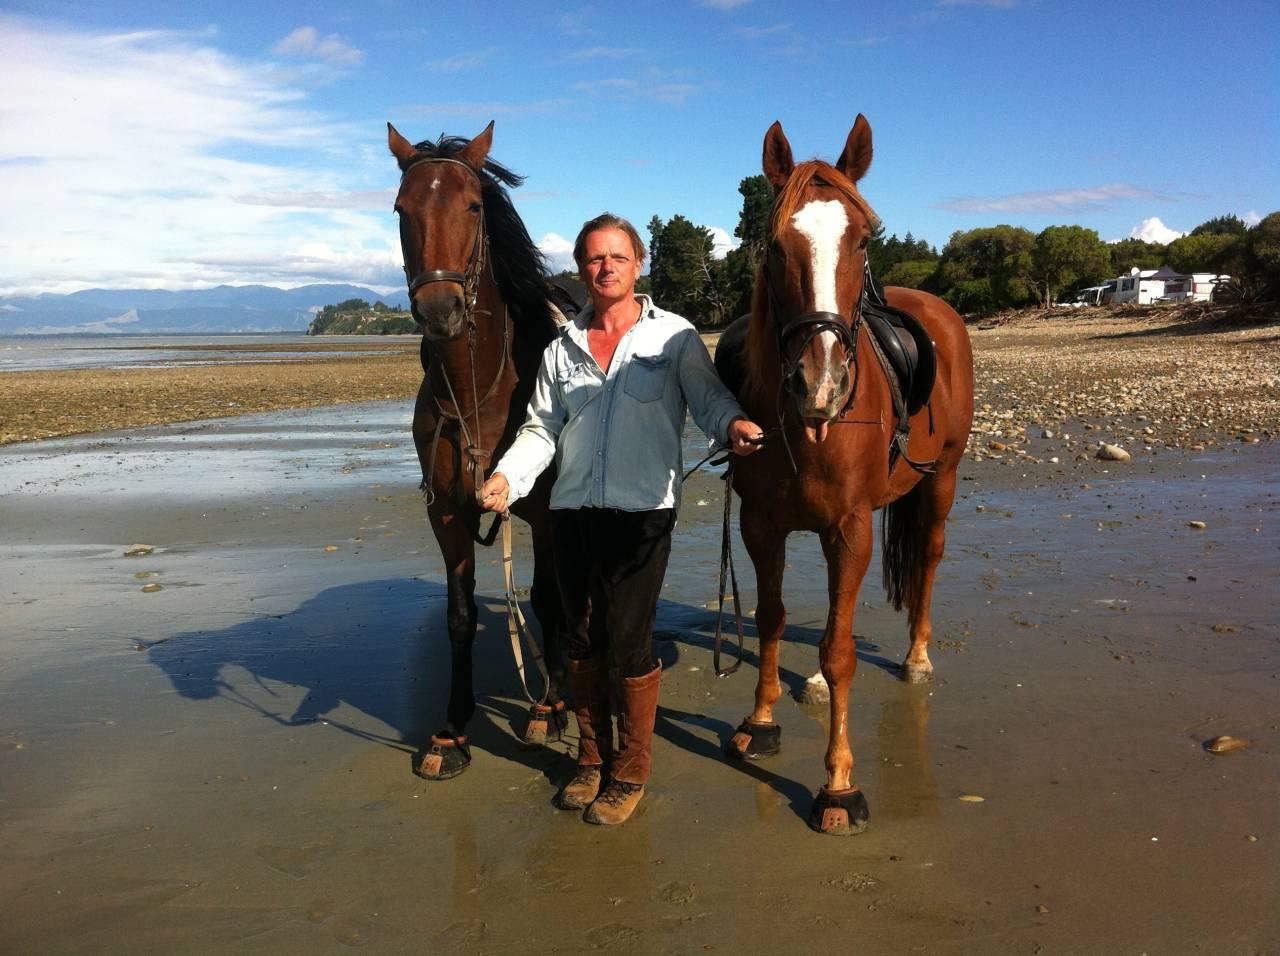 At Kina Beach with the horses